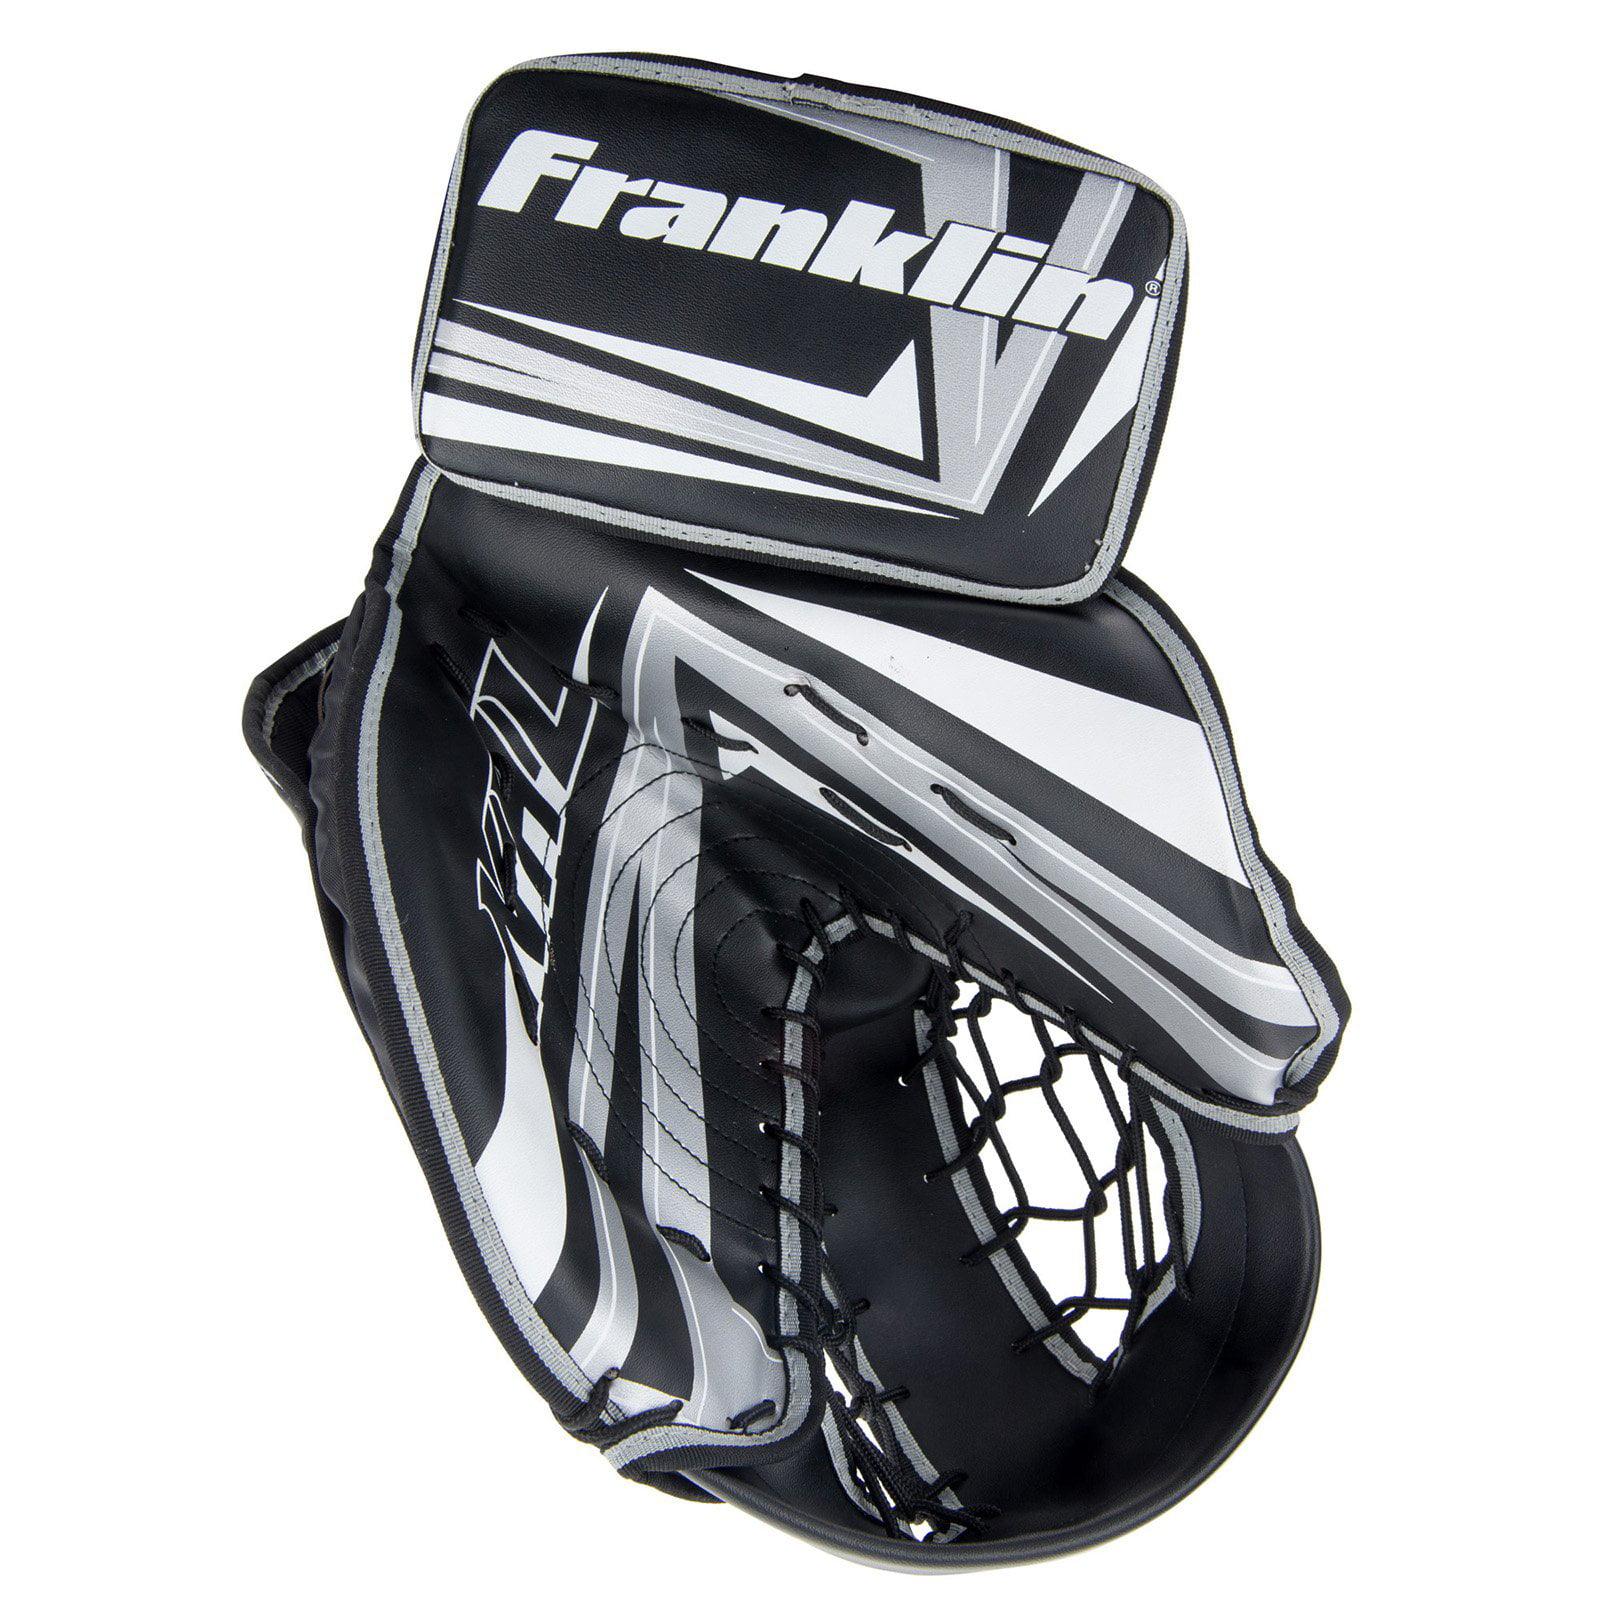 "Franklin Sports NHL GC 130 Jr. 11"" Goalie Catch Glove"